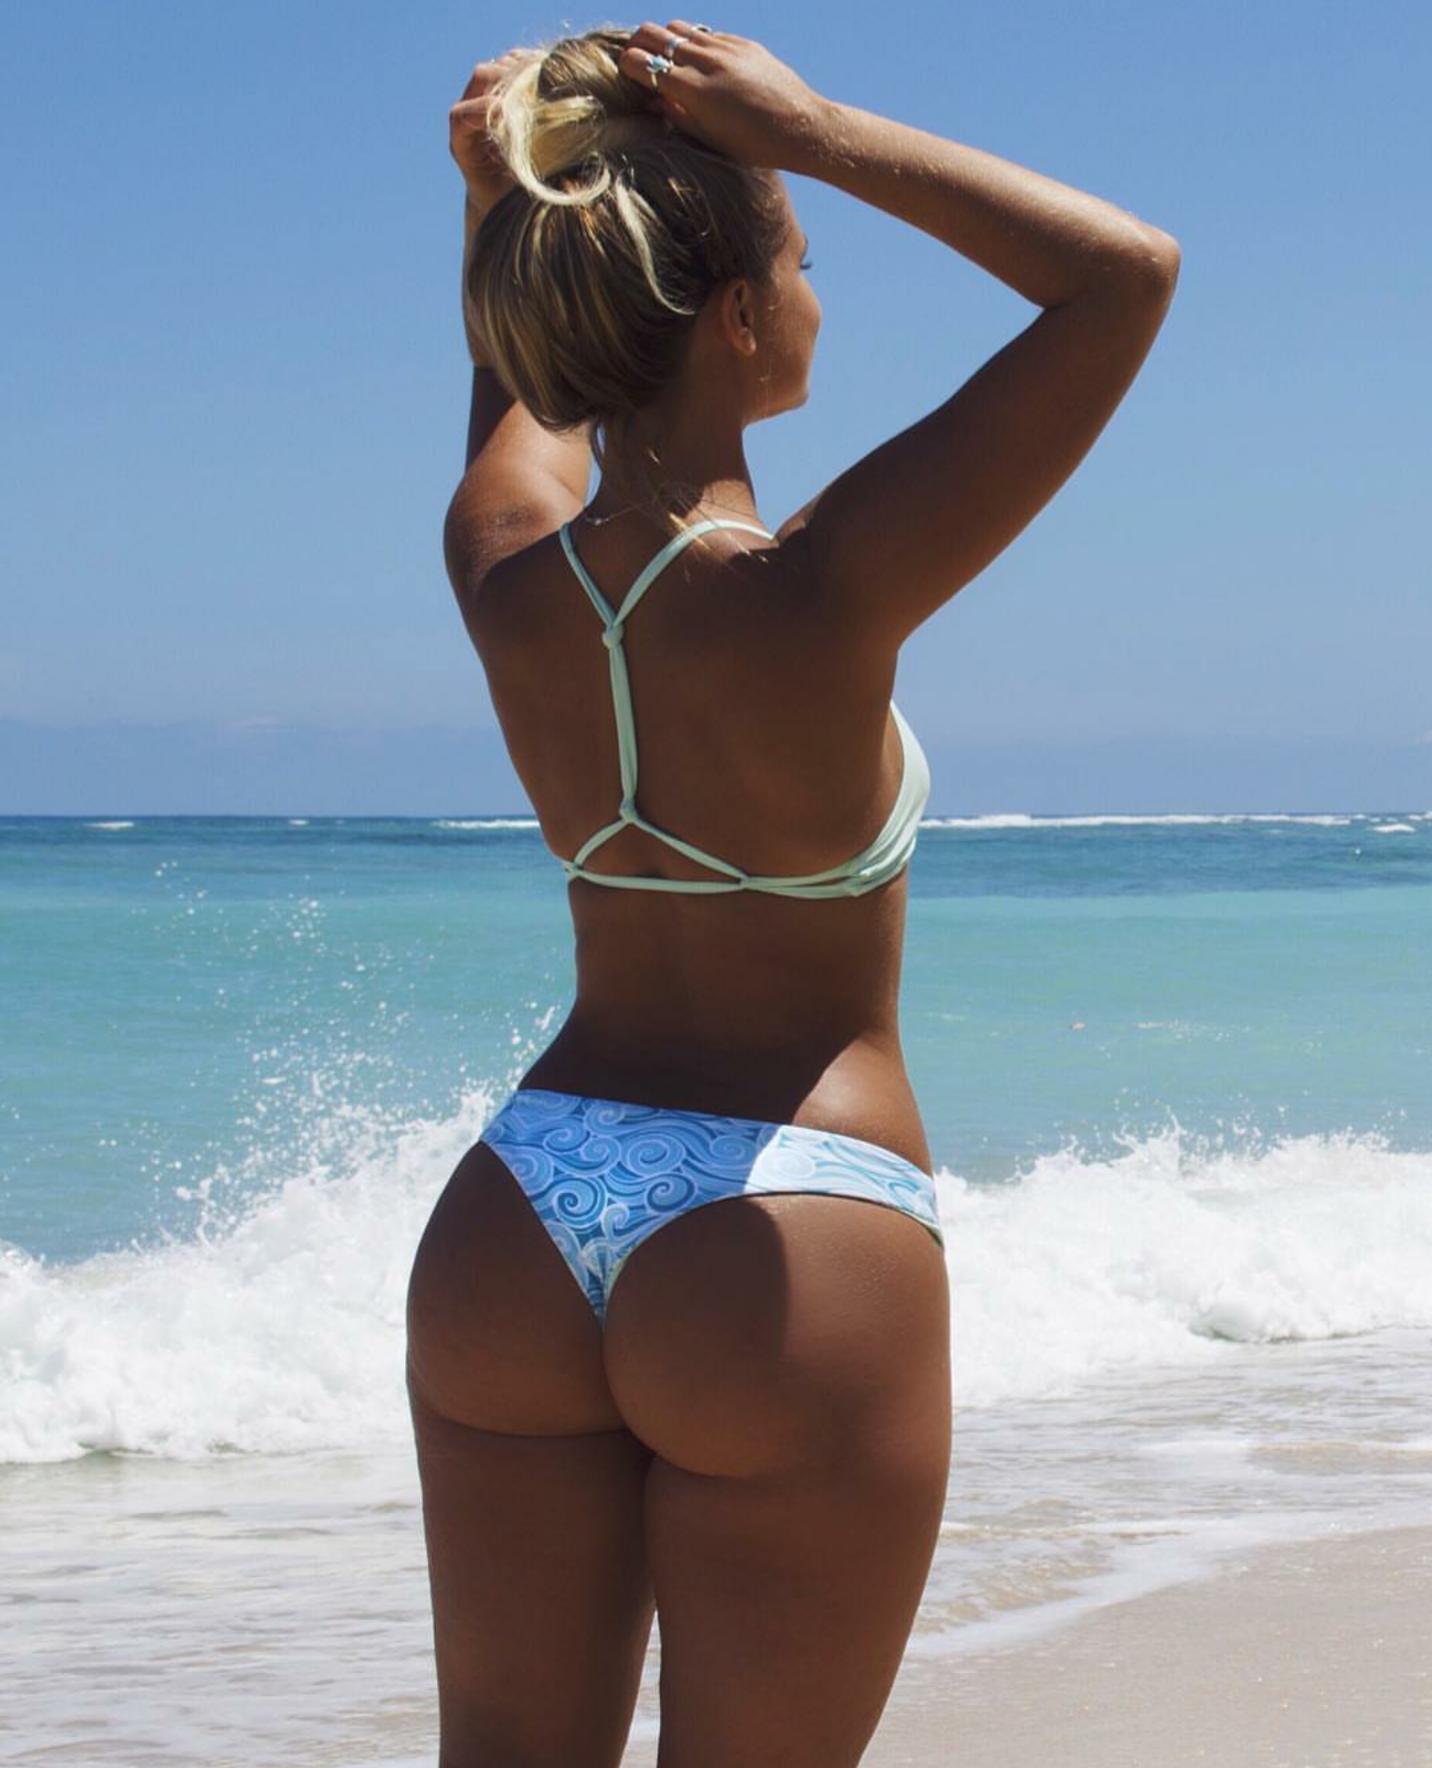 Bikini Girls Kickin' Off Bikini Season – Stalkeri   Daily Girls @ Female Update